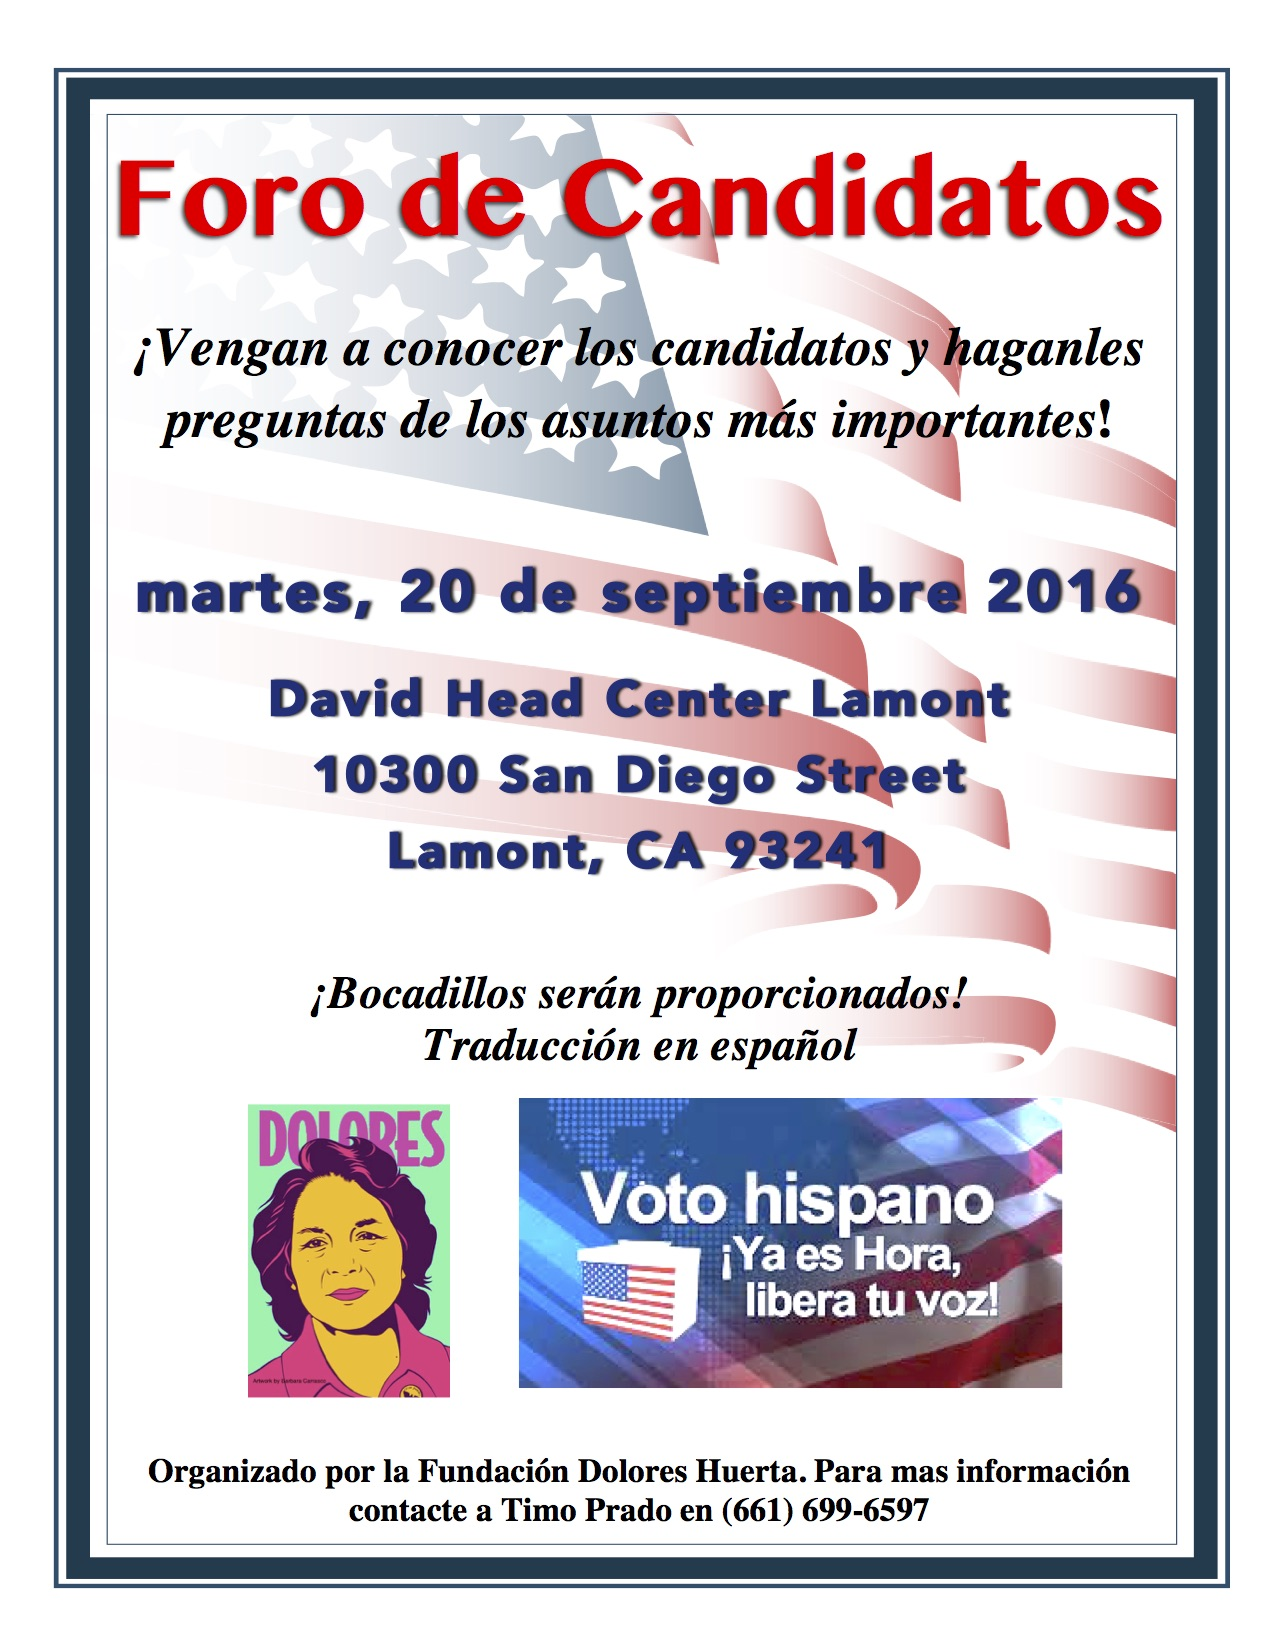 Foro de Candidatos Lamont 9-20-16